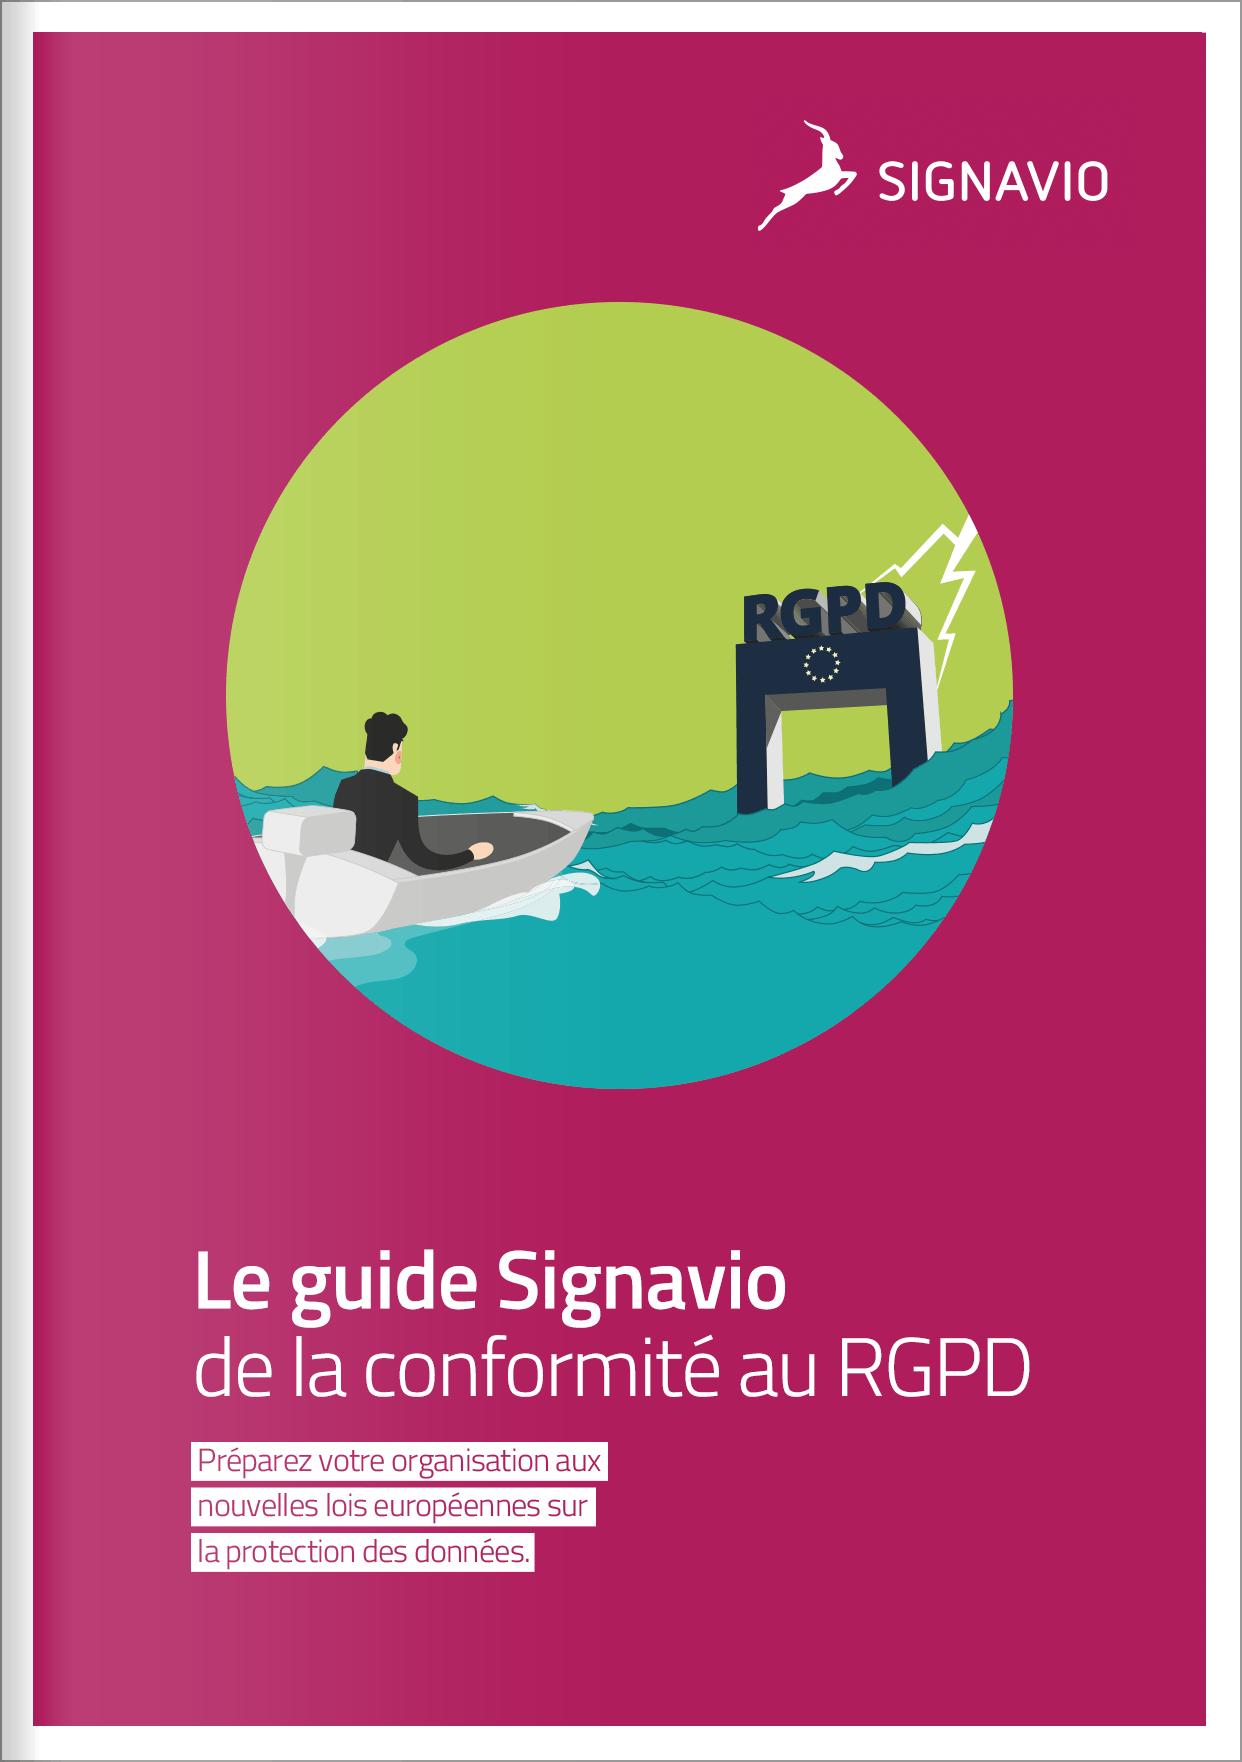 signavio-rgpd-guide-fr